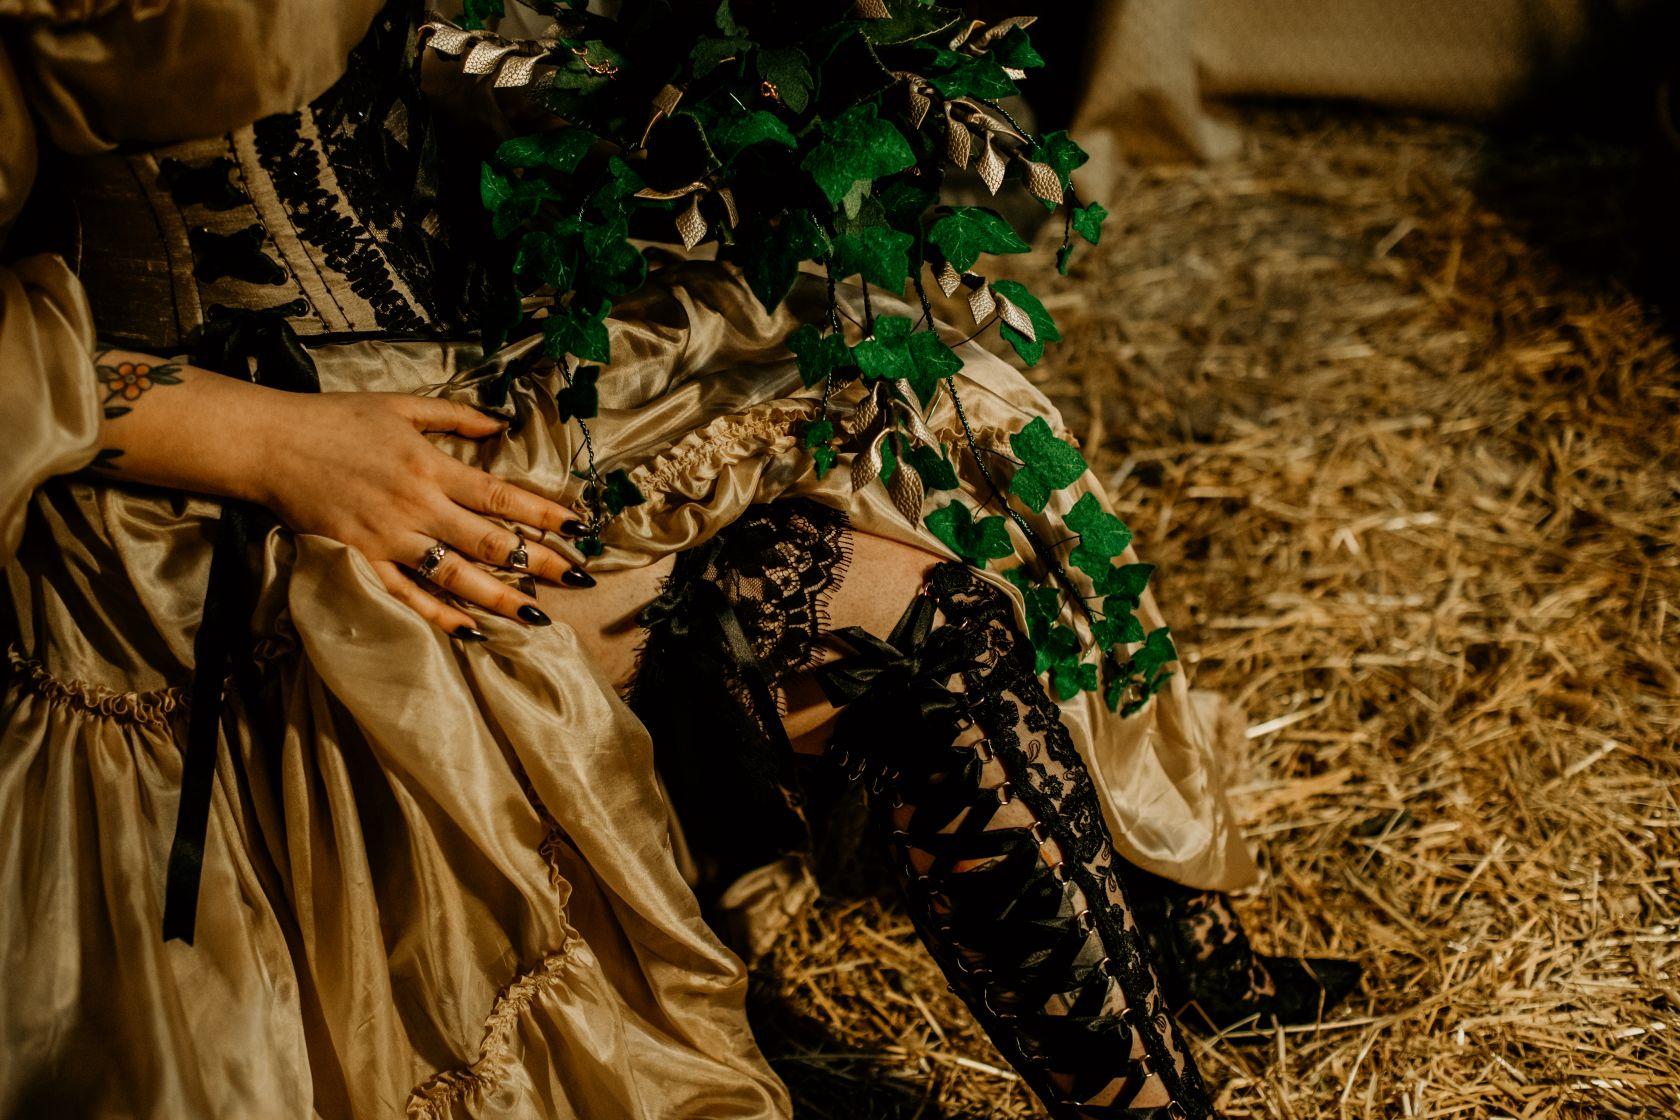 alternative fairytale wedding- snow white wedding- charlotte laurie designs-chloe mary photo- unconventional wedding- alternative wedding inspiration- wedding lace boots